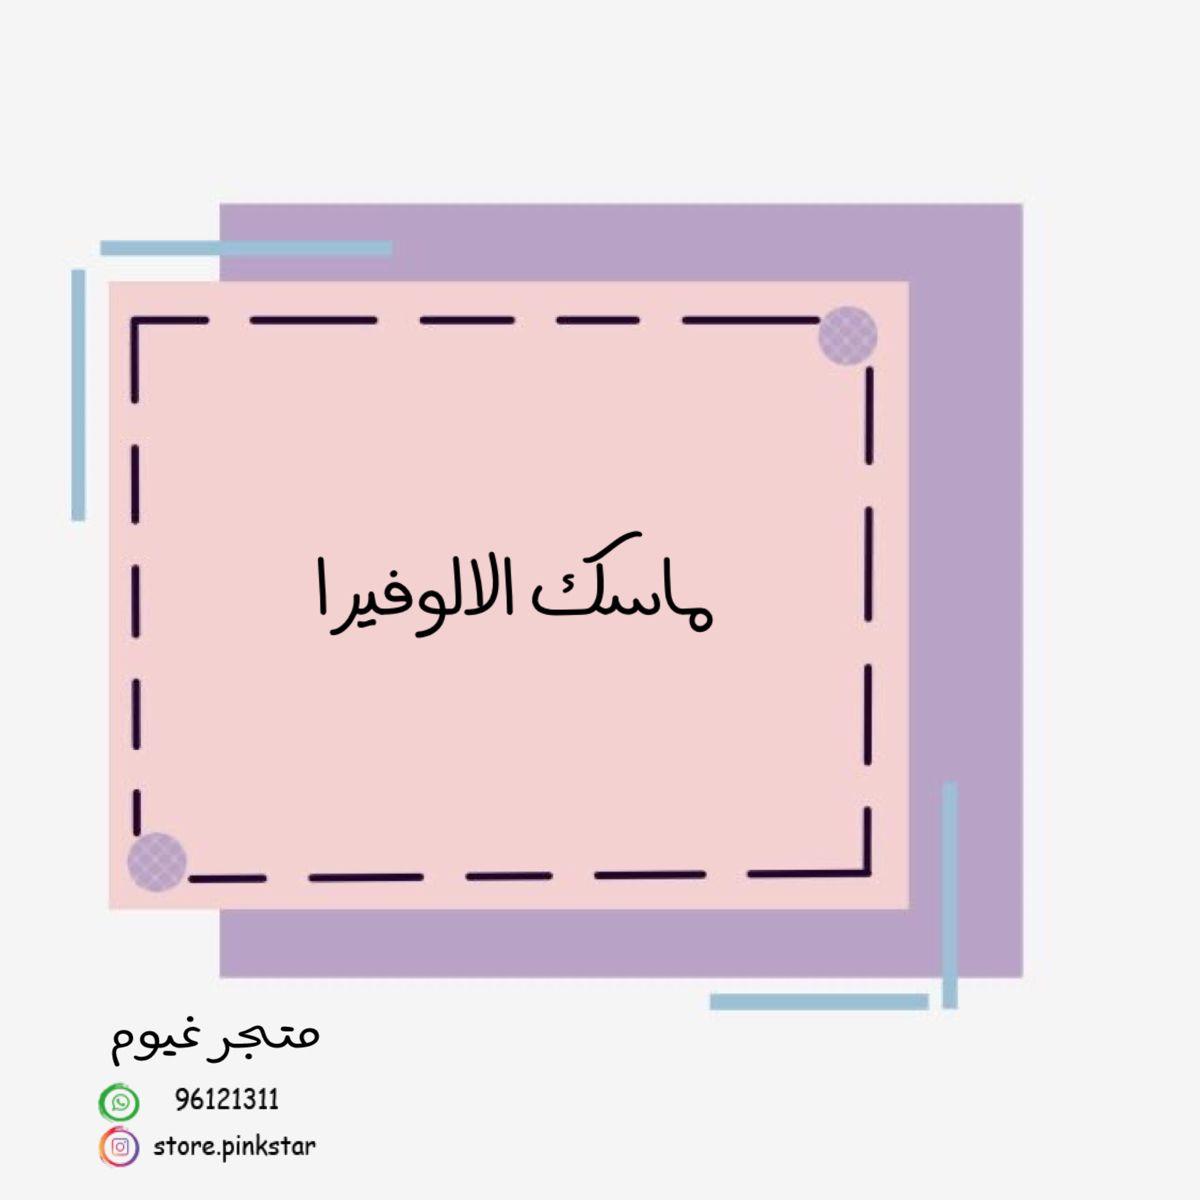 ماسك الالوفيرا Office Supplies Store Supplies